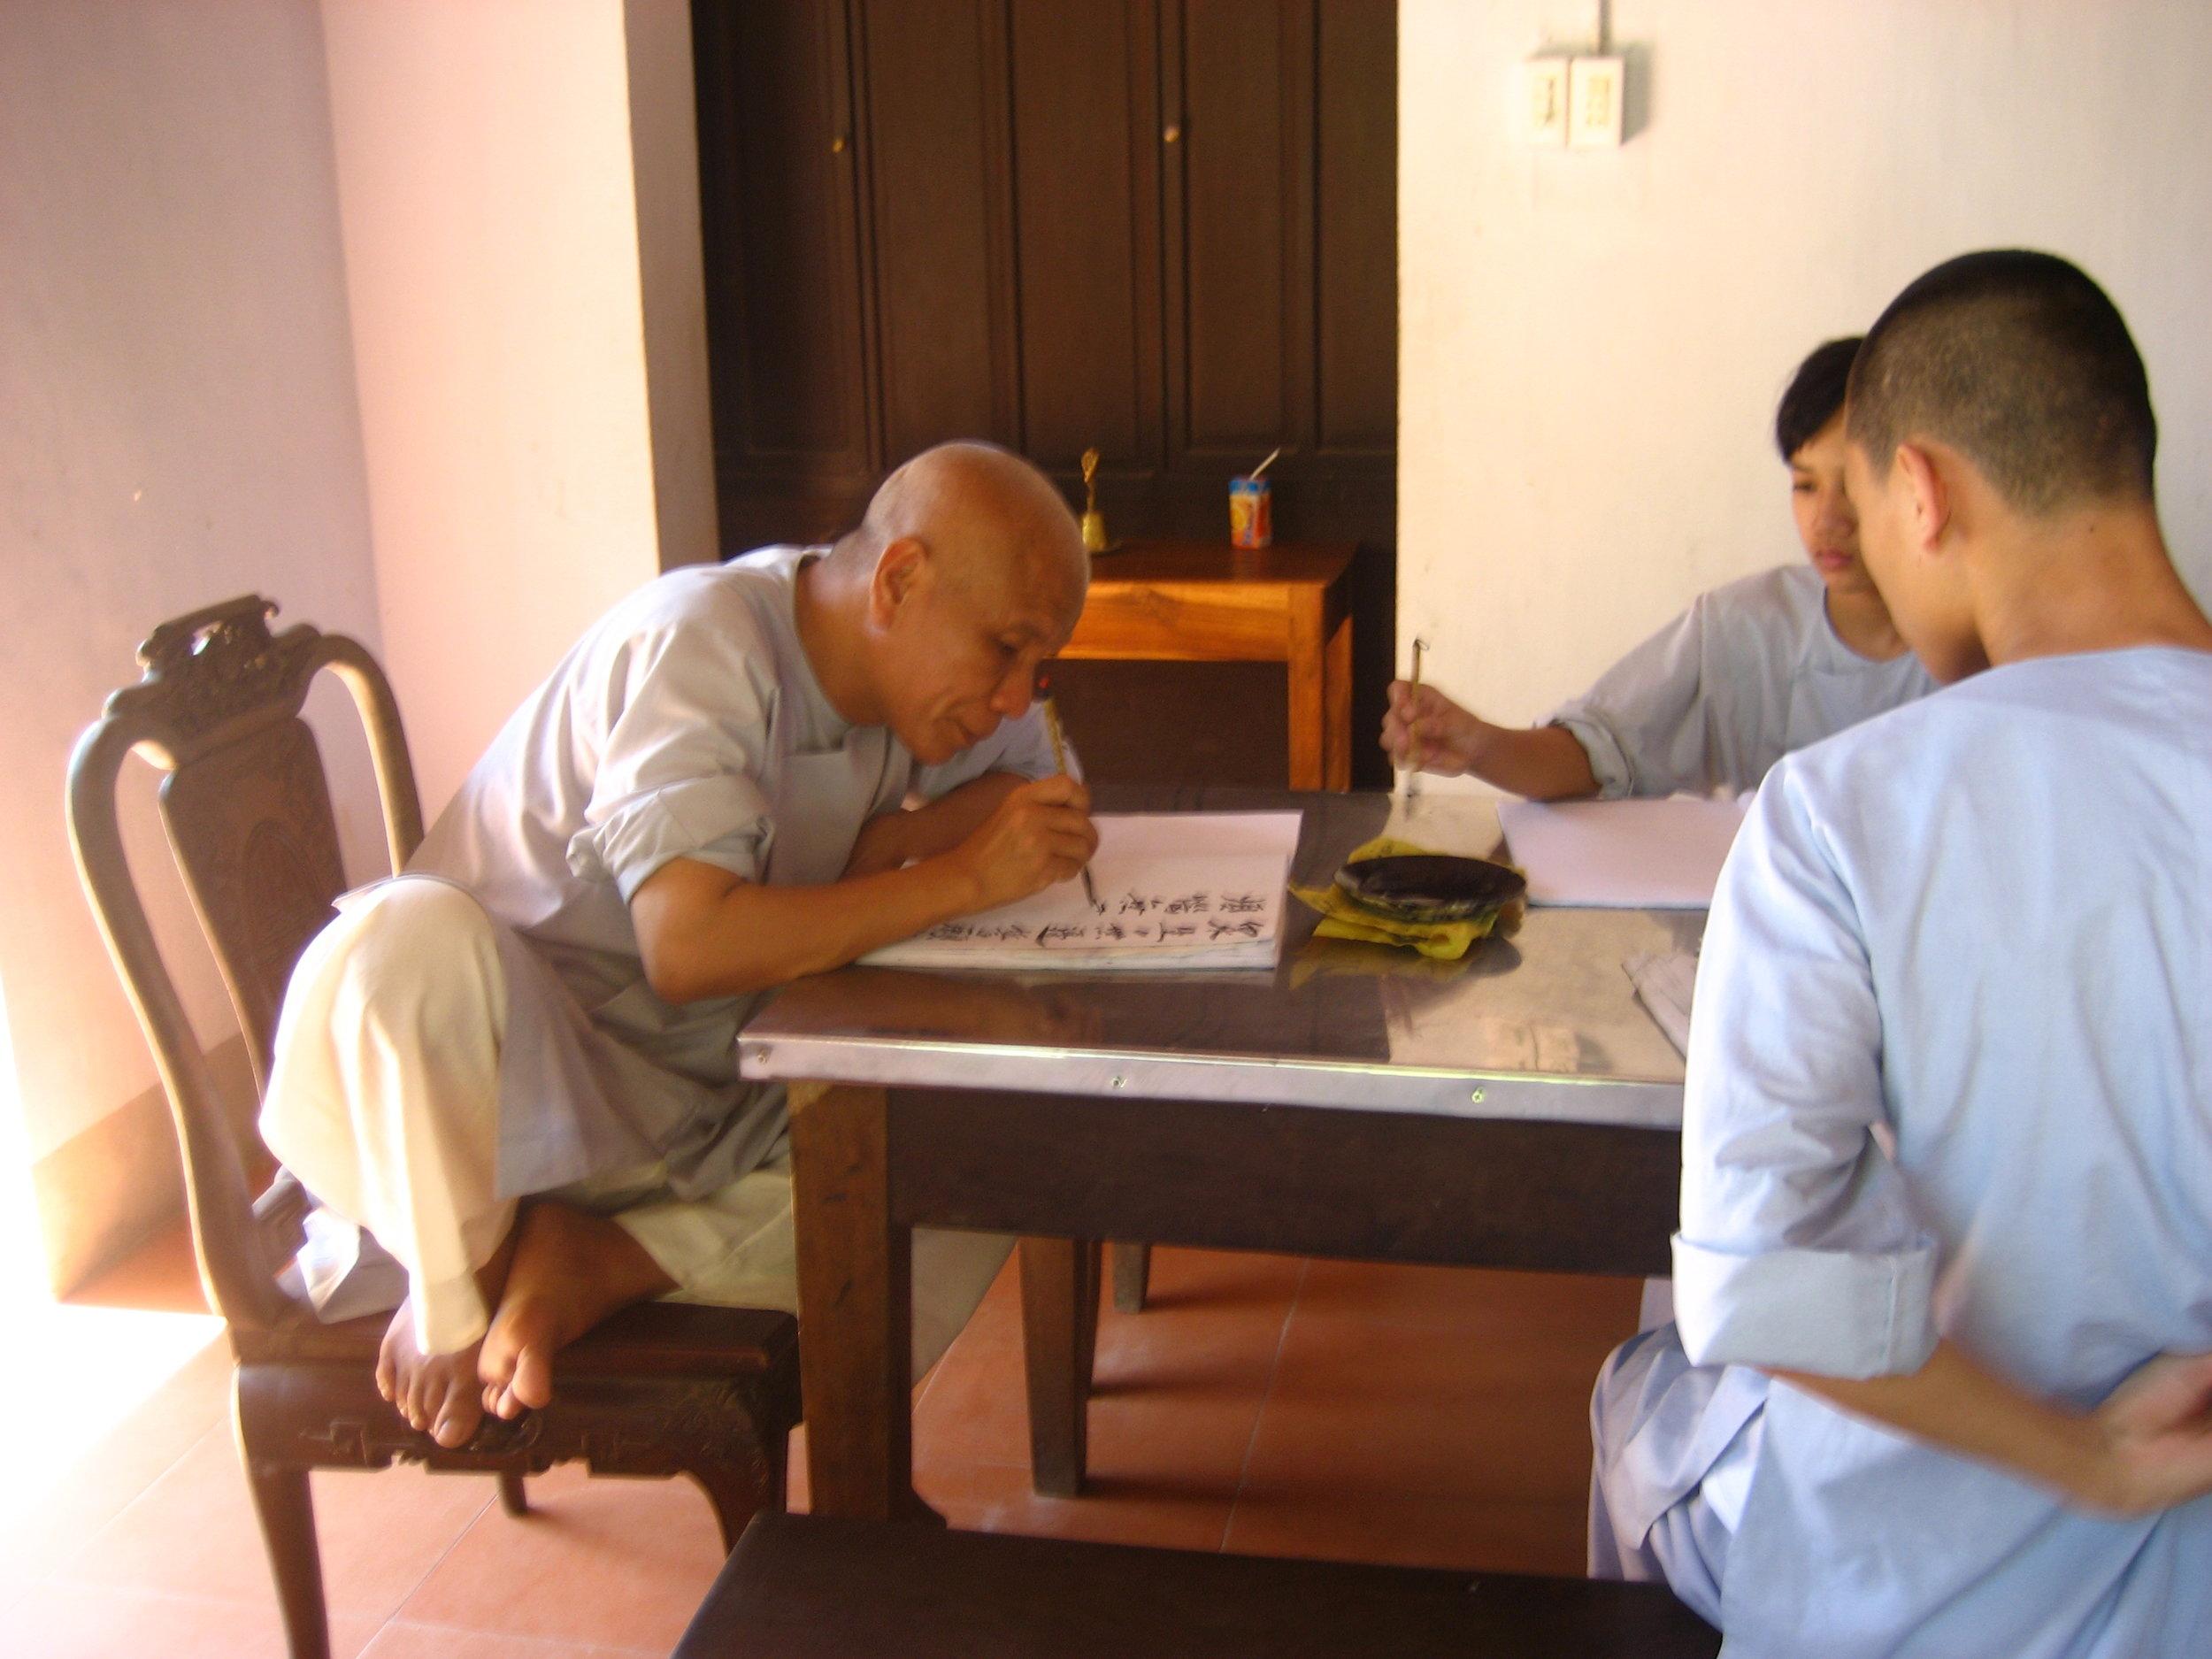 Monks hard at work, somehow ignoring stupid tourists.